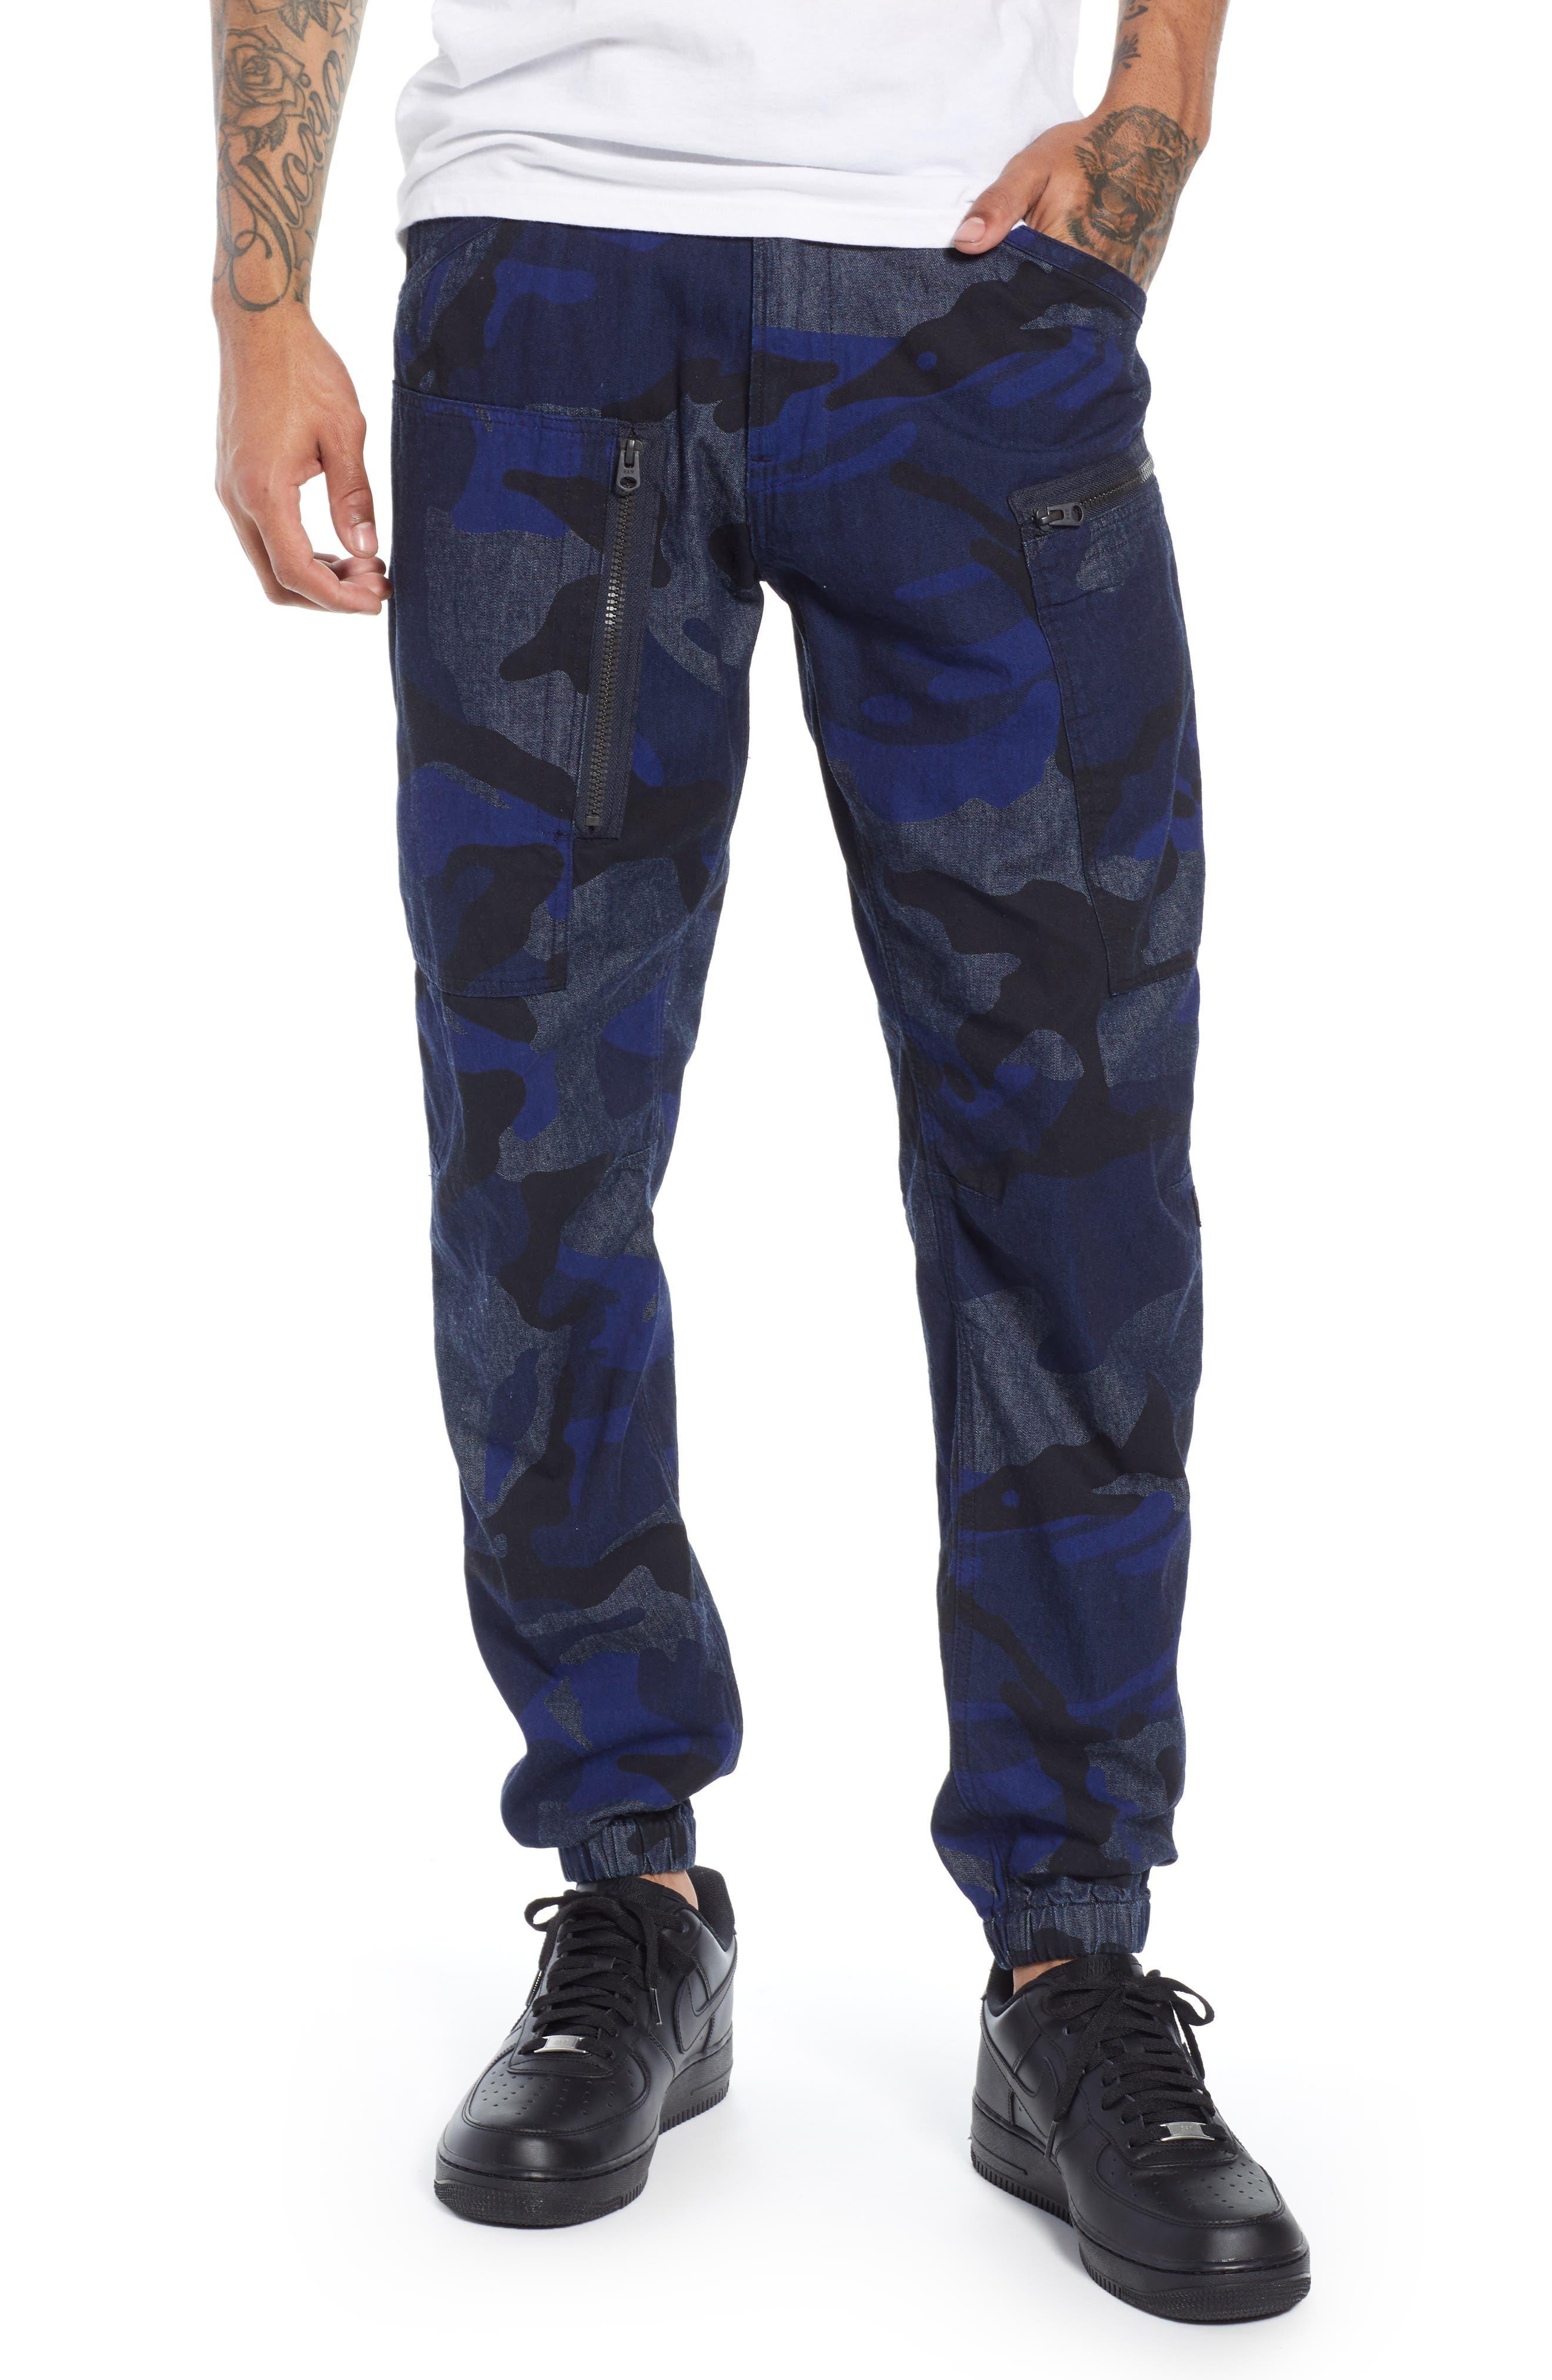 Powel Tapered Pants,                             Main thumbnail 1, color,                             RAW DENIM/ PHANTOM BLUE